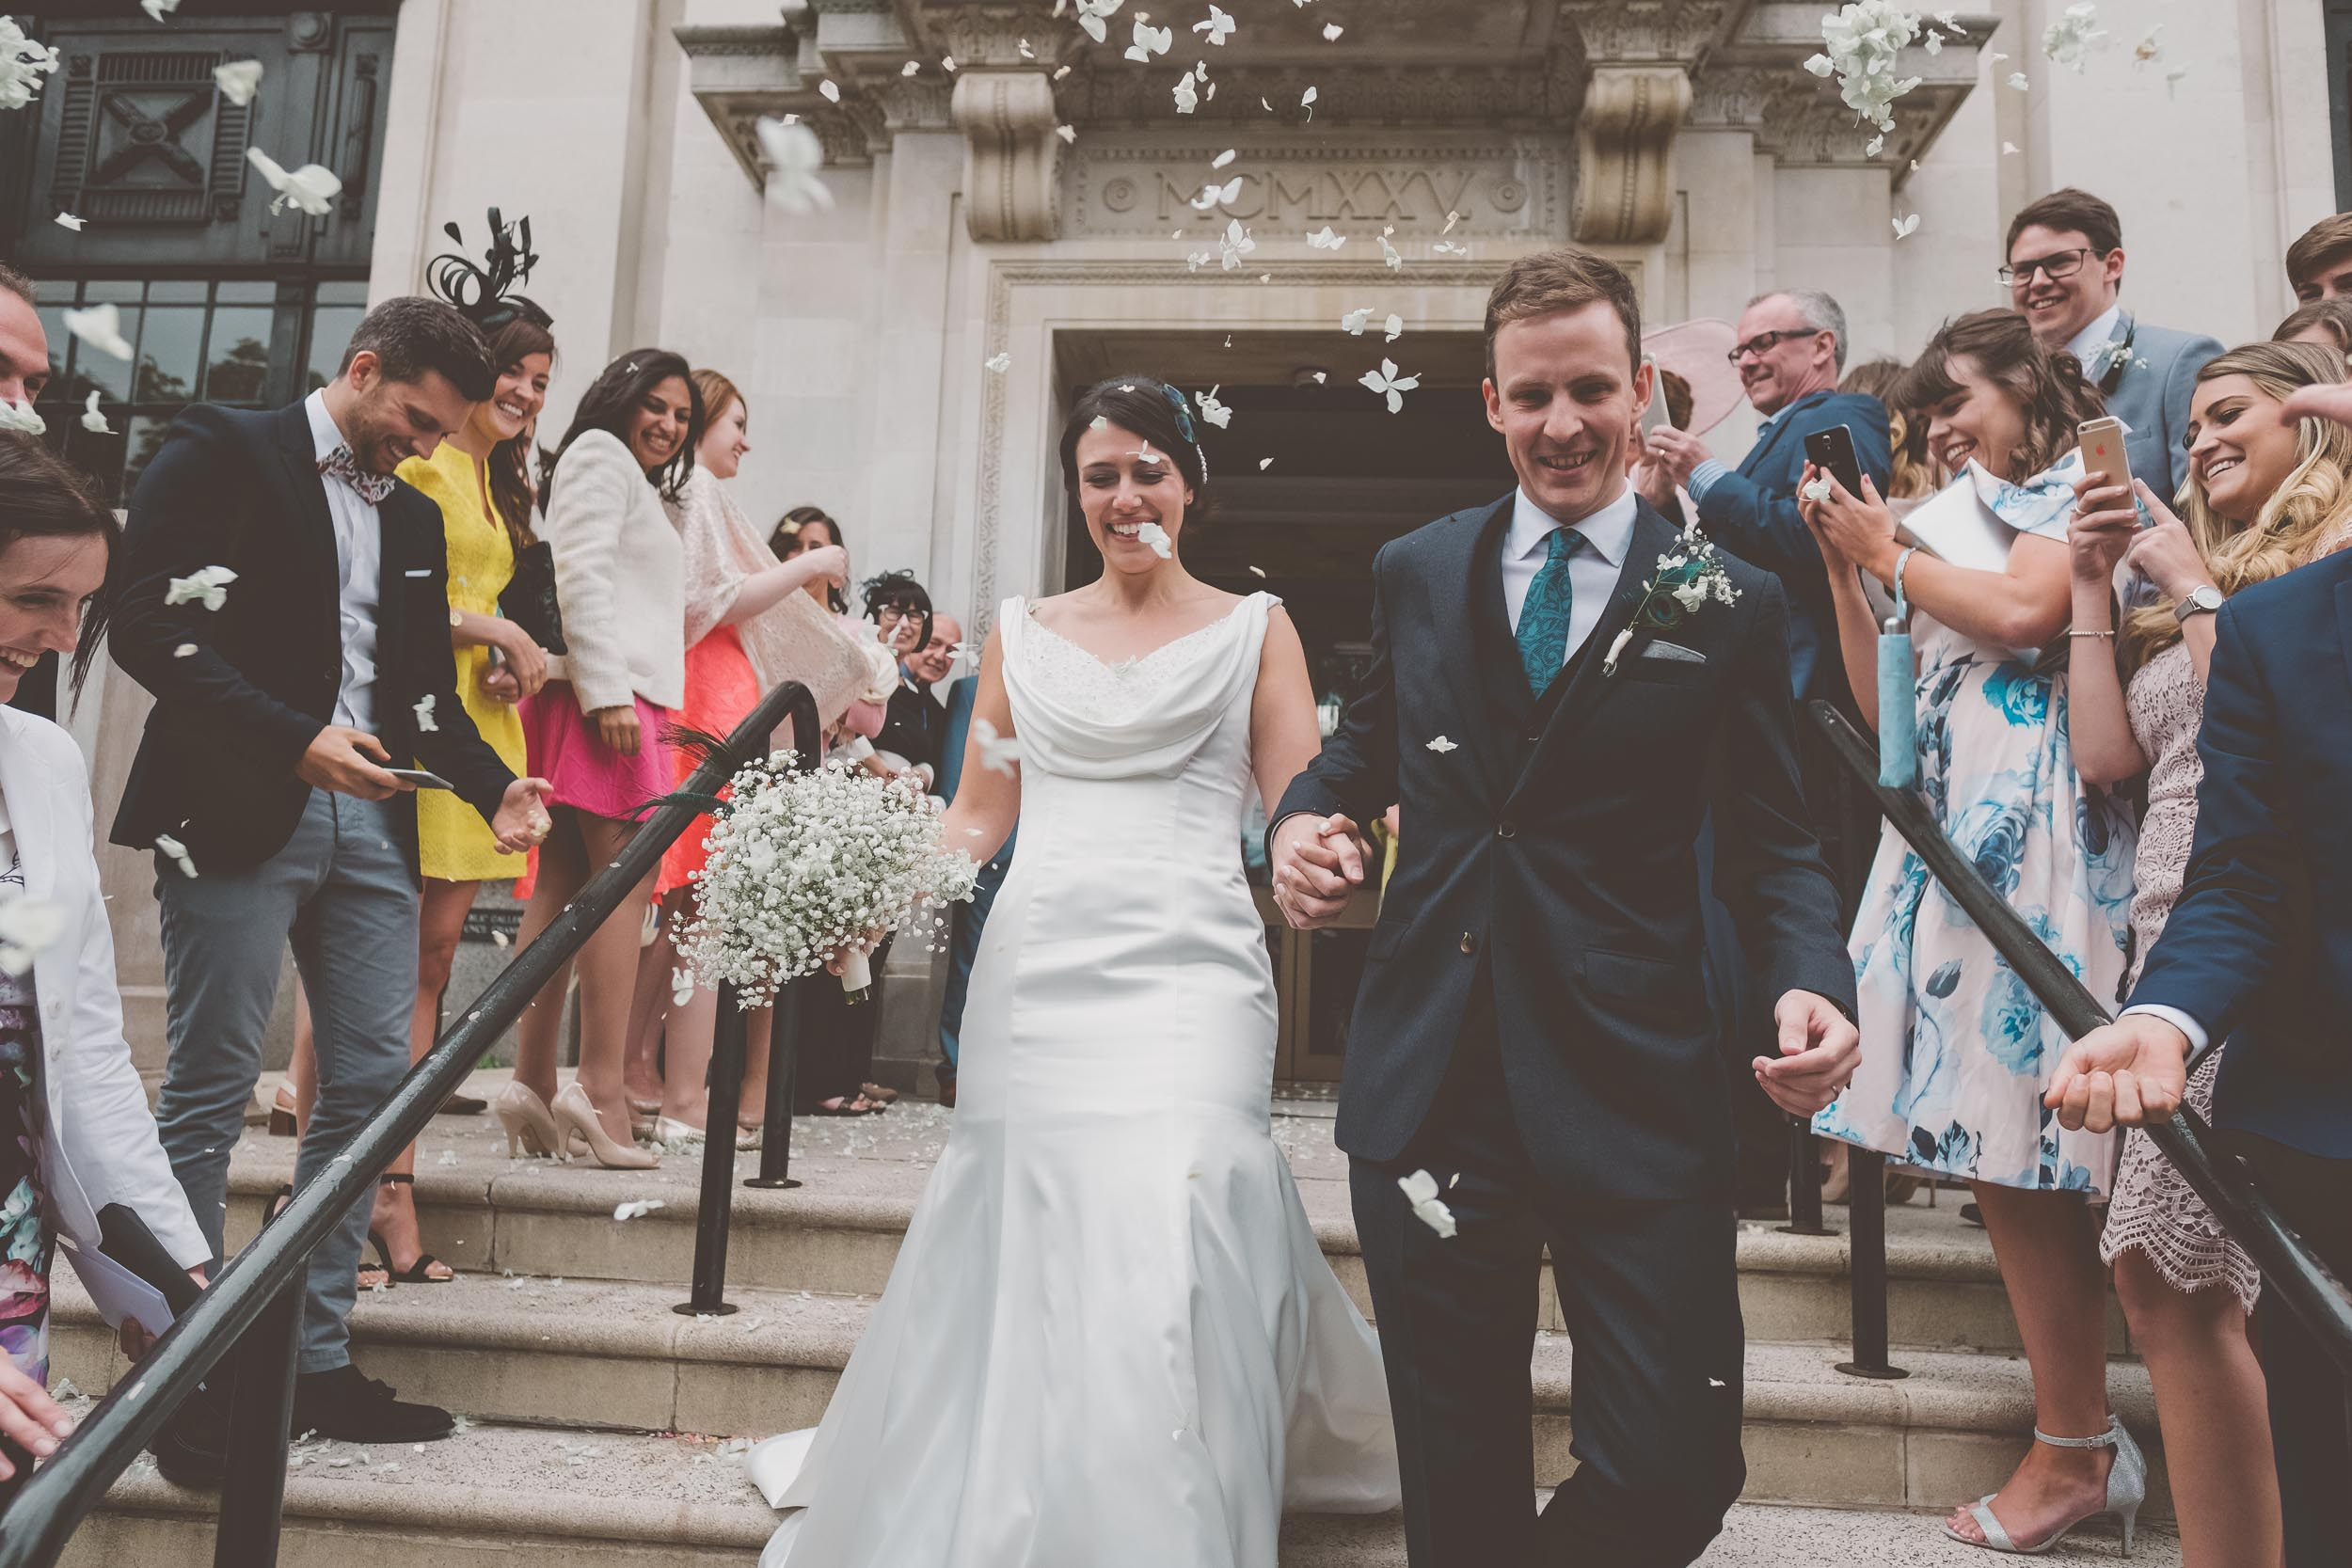 islington-town-hall-4th-floor-studios-wedding154.jpg